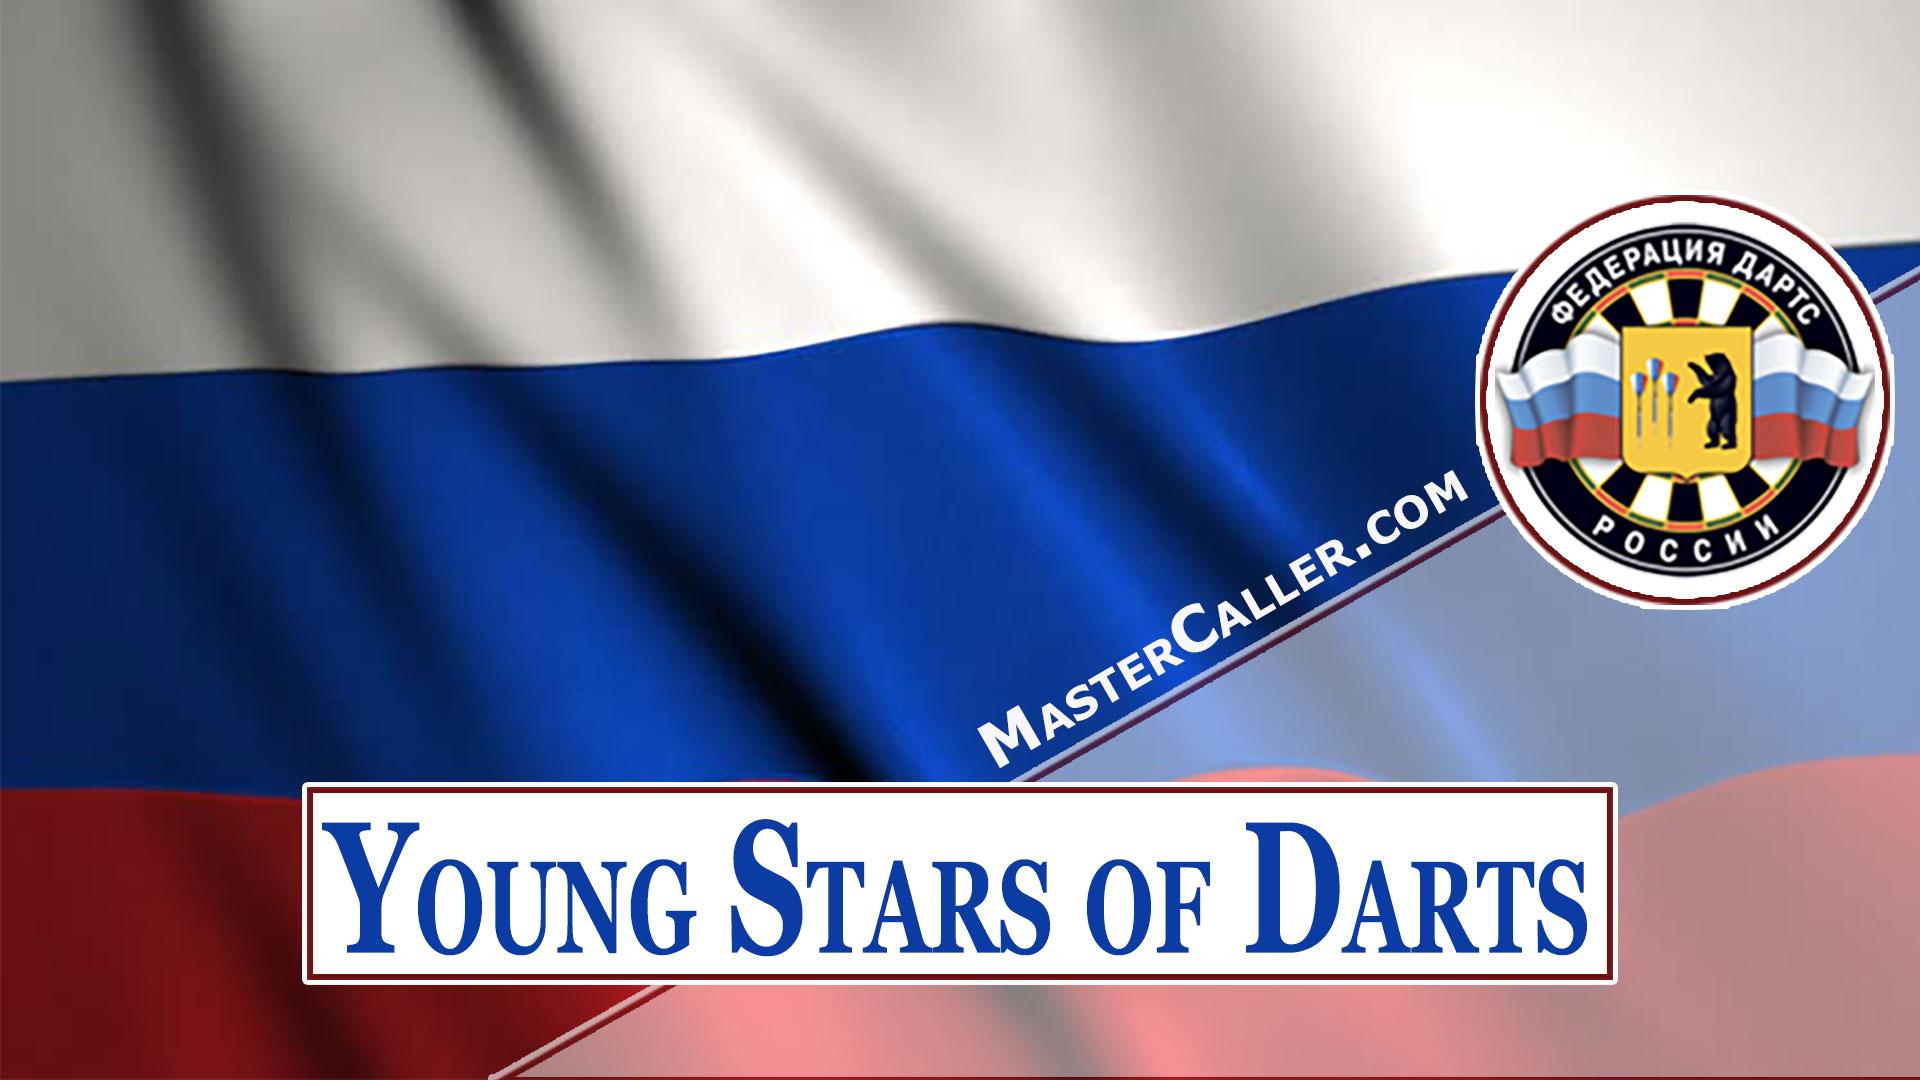 Young Stars of Darts Girls - 2021 Logo